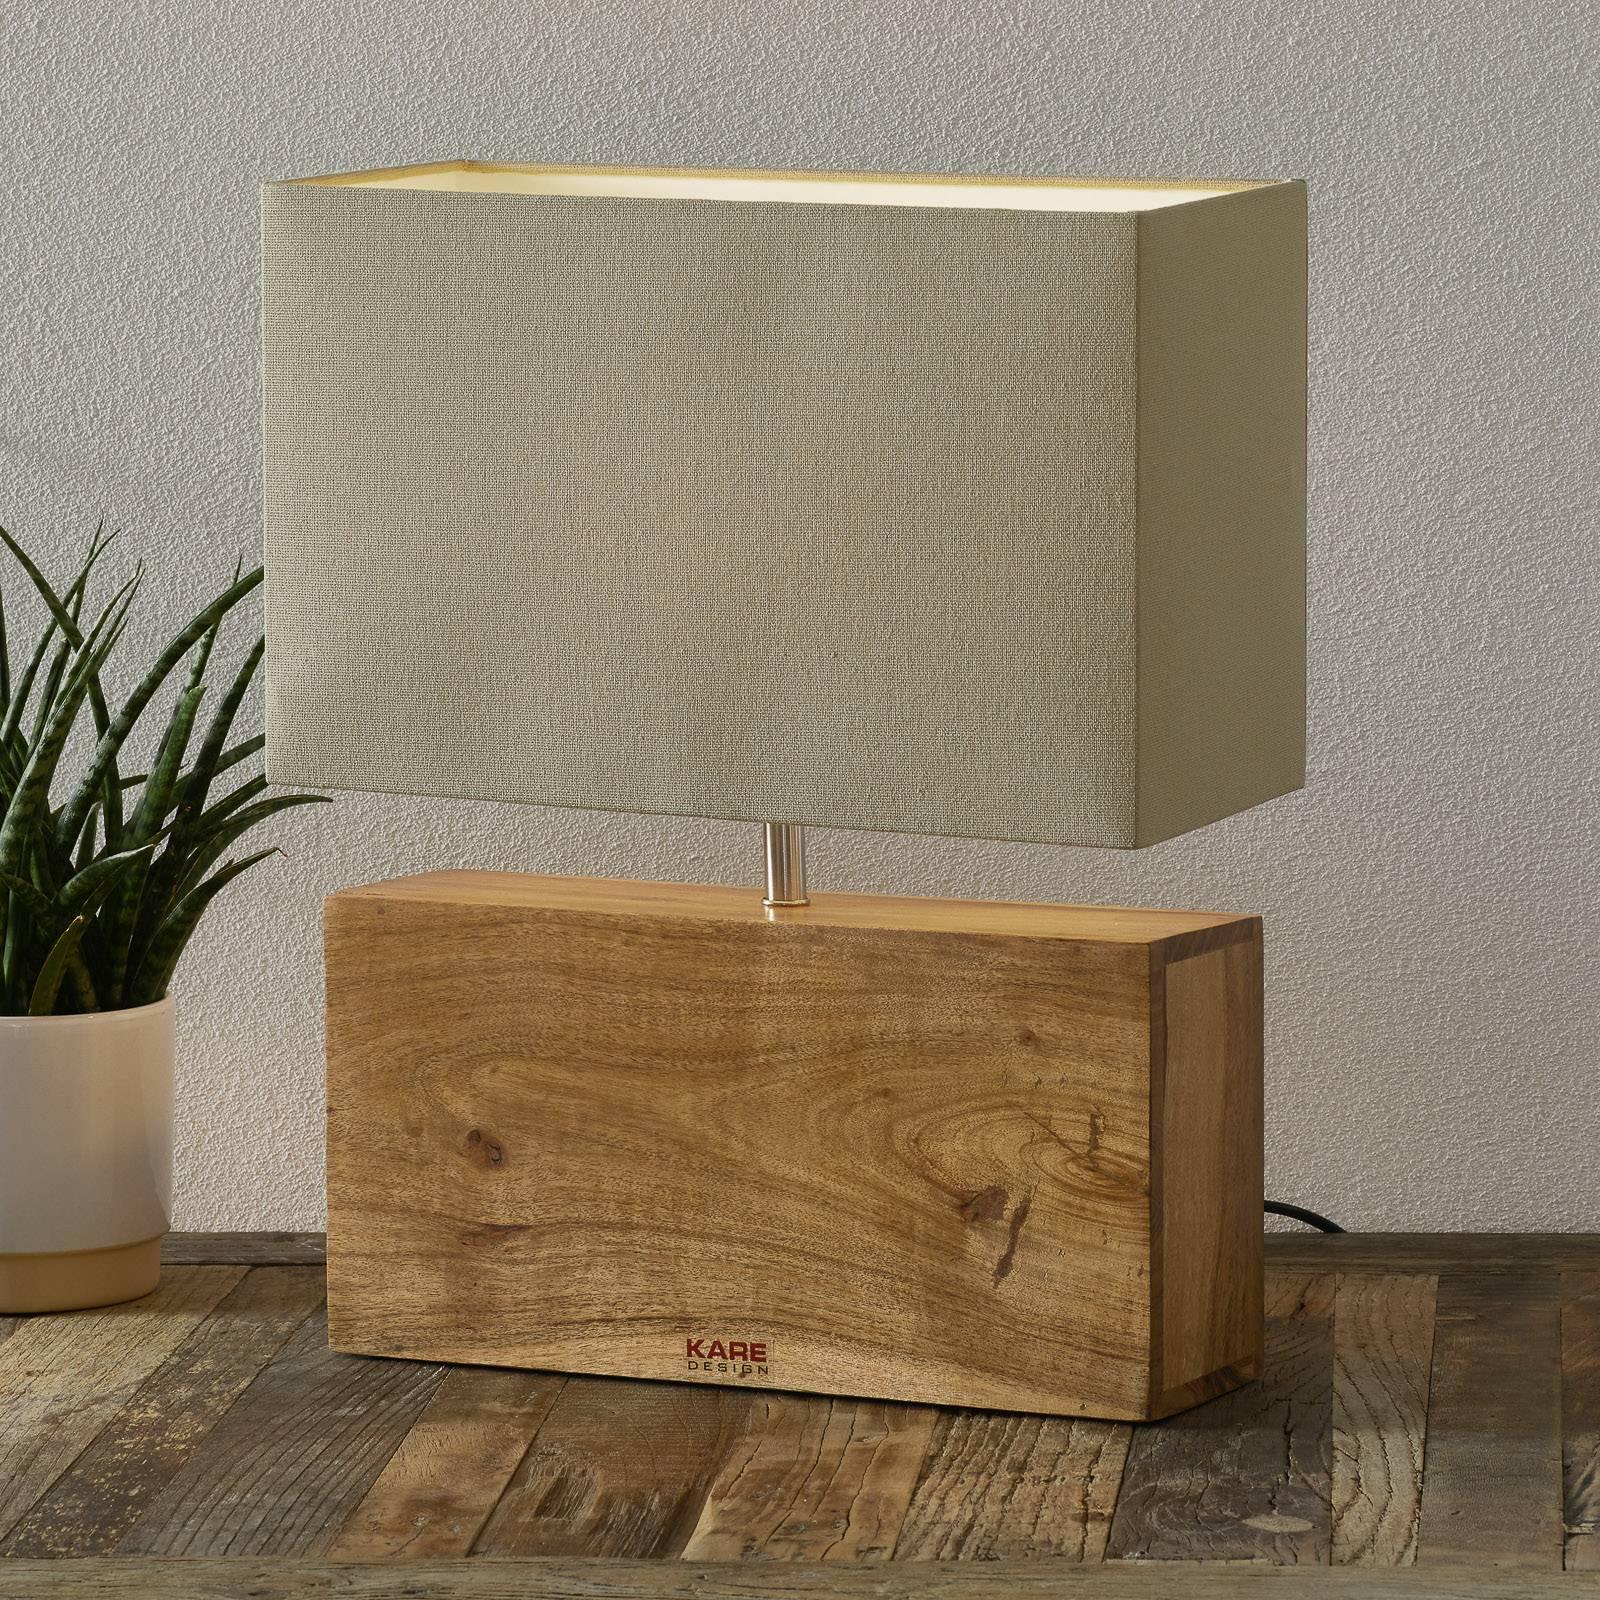 KARE Rectangular Wood - lampe à poser en bois